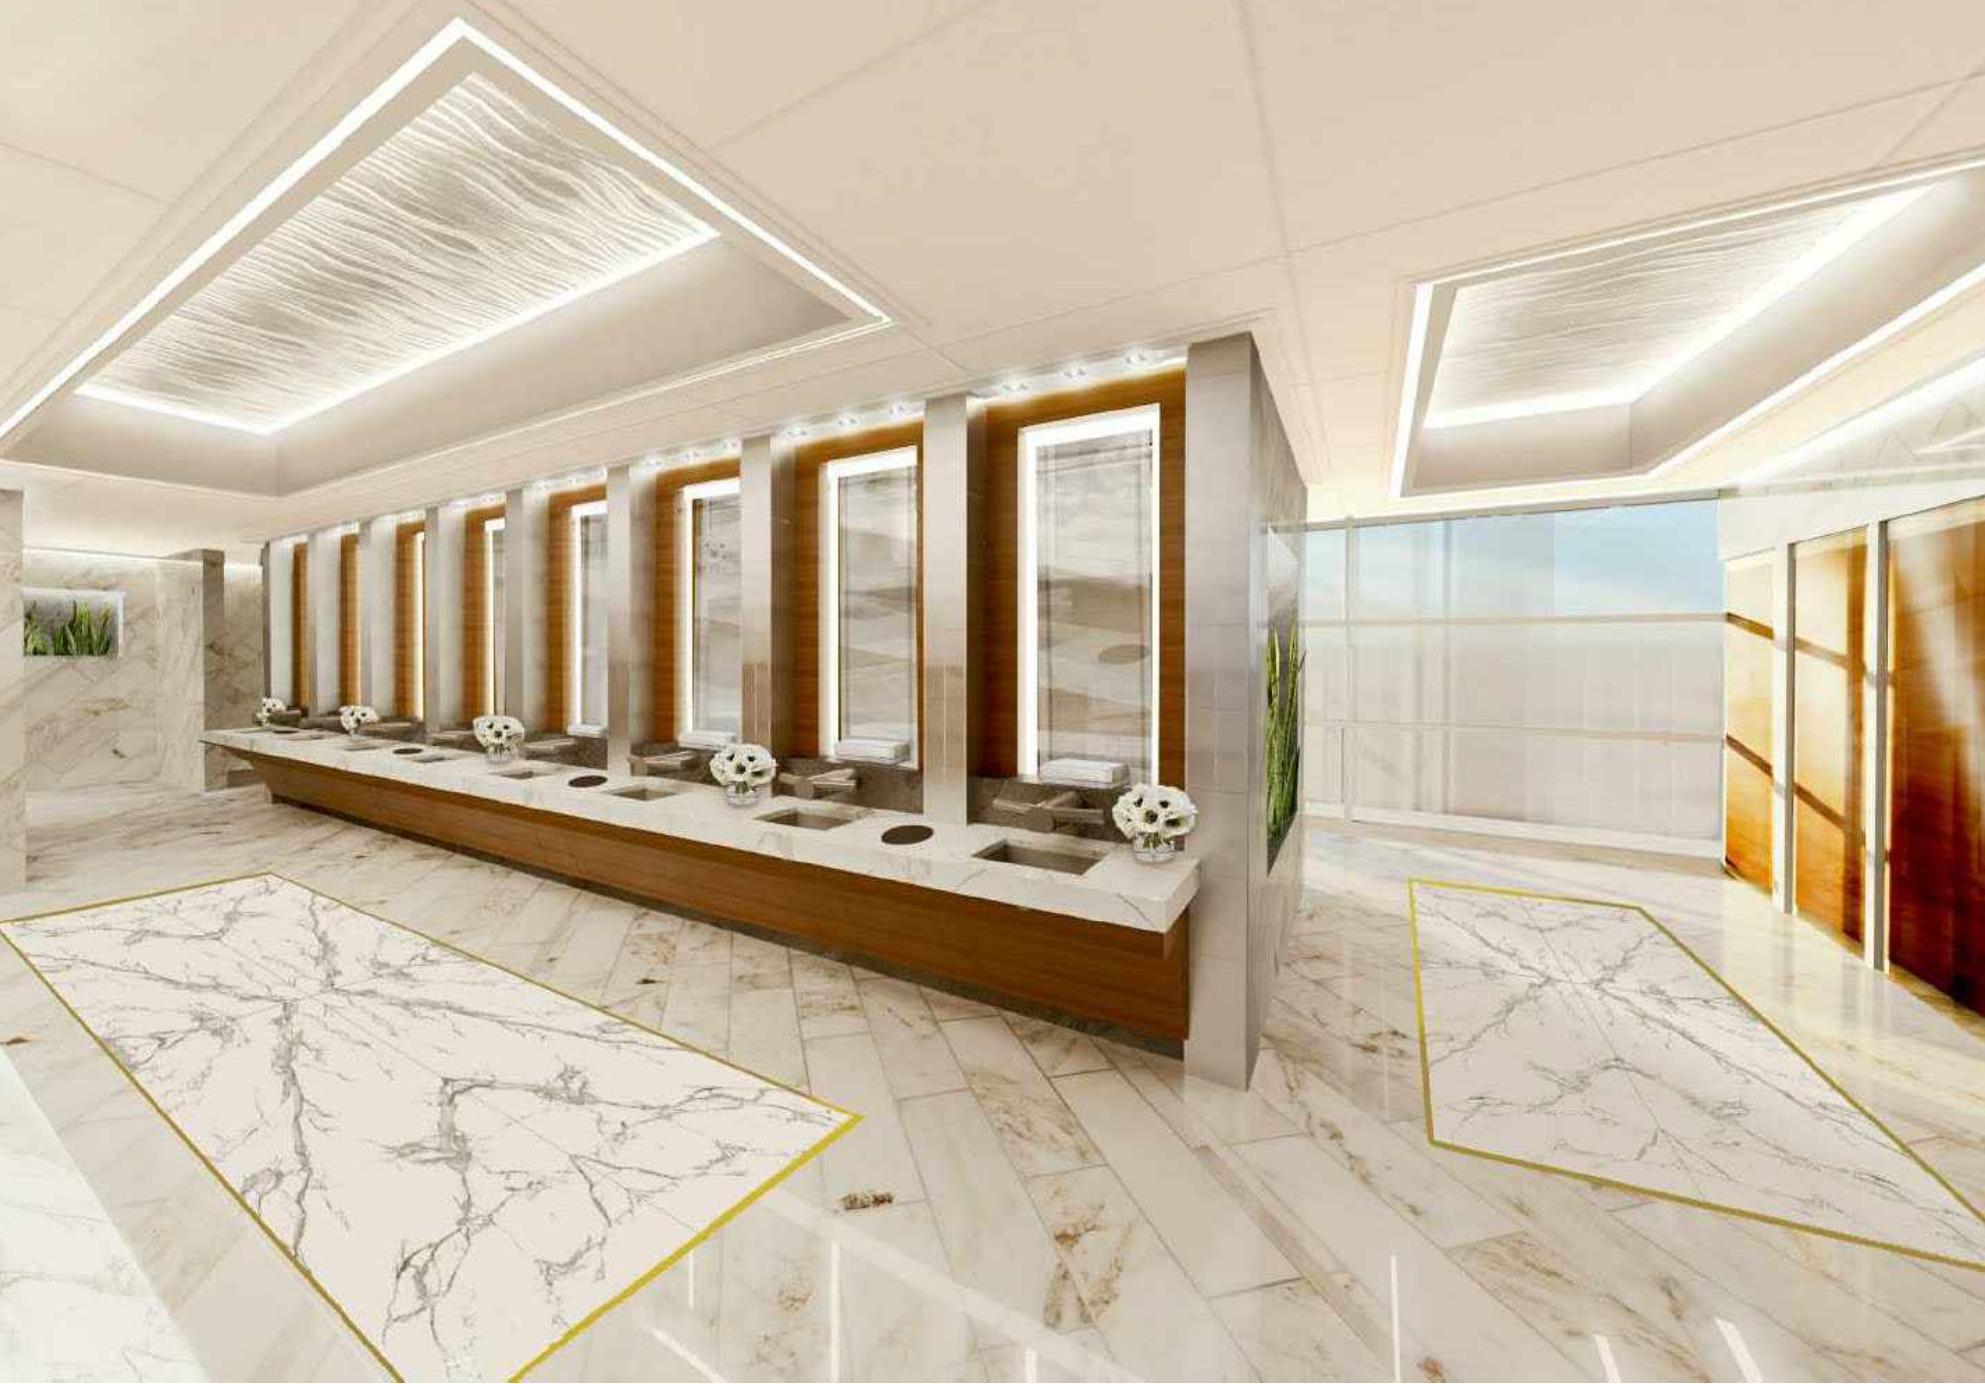 T. F. Green Airport Restroom modernization begins